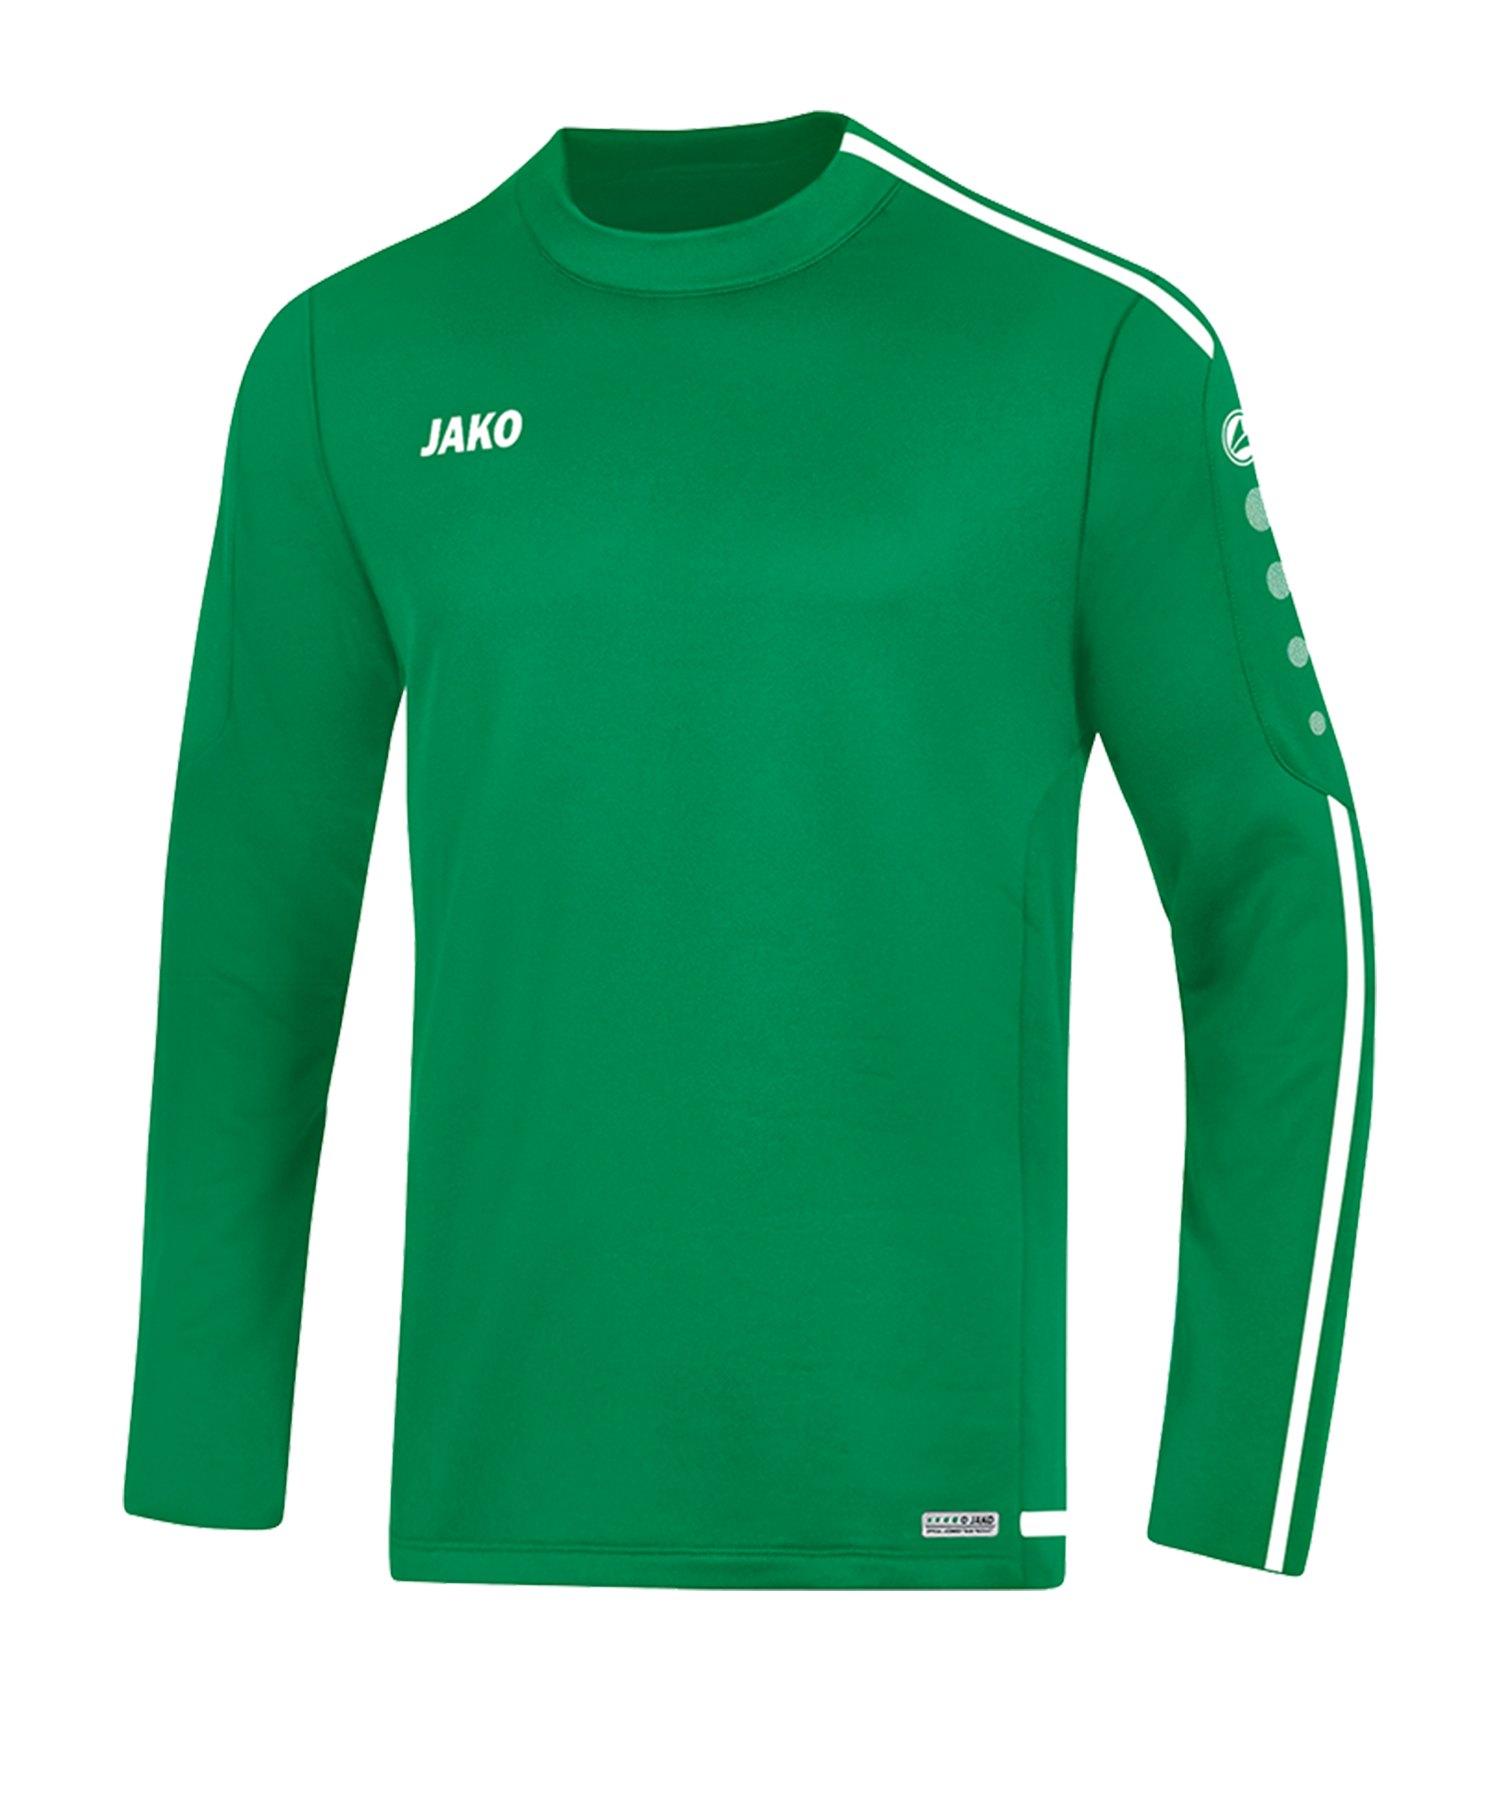 Jako Striker 2.0 Sweatshirt Grün Weiss F06 - Gruen